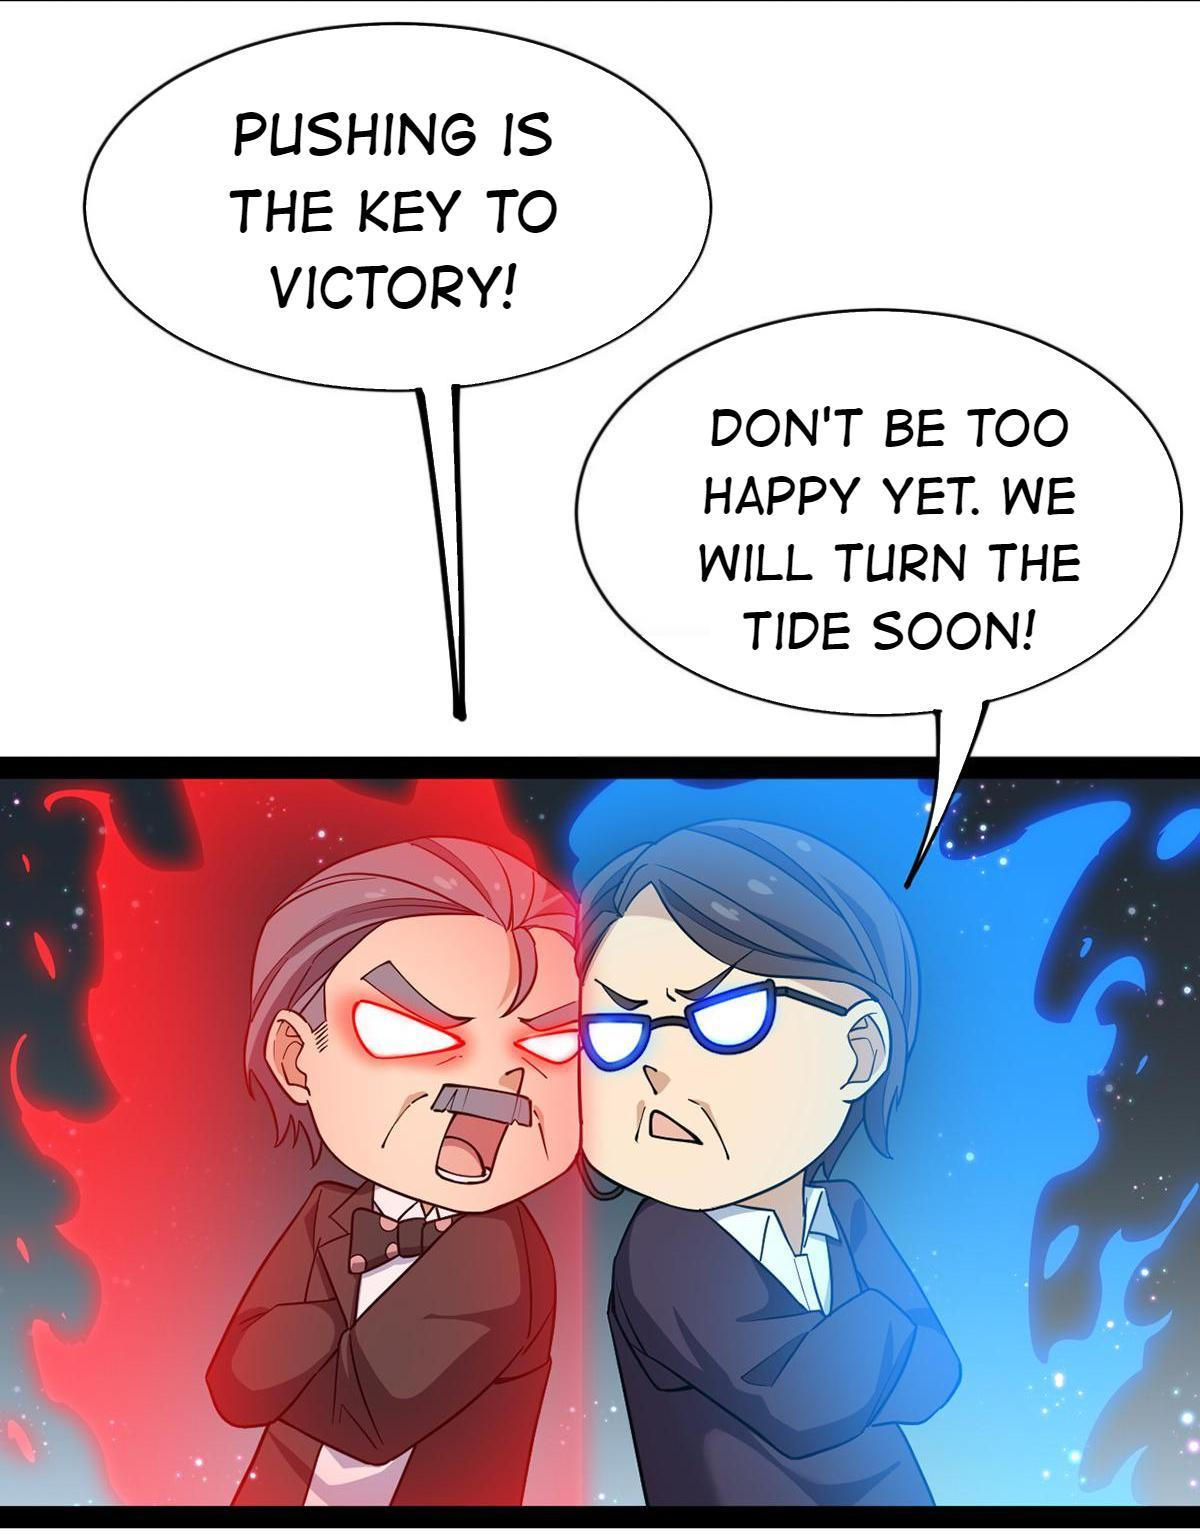 The Daily Life Of Immortal King Chapter 49: I Am Best At Lane Pushing! page 4 - Mangakakalot